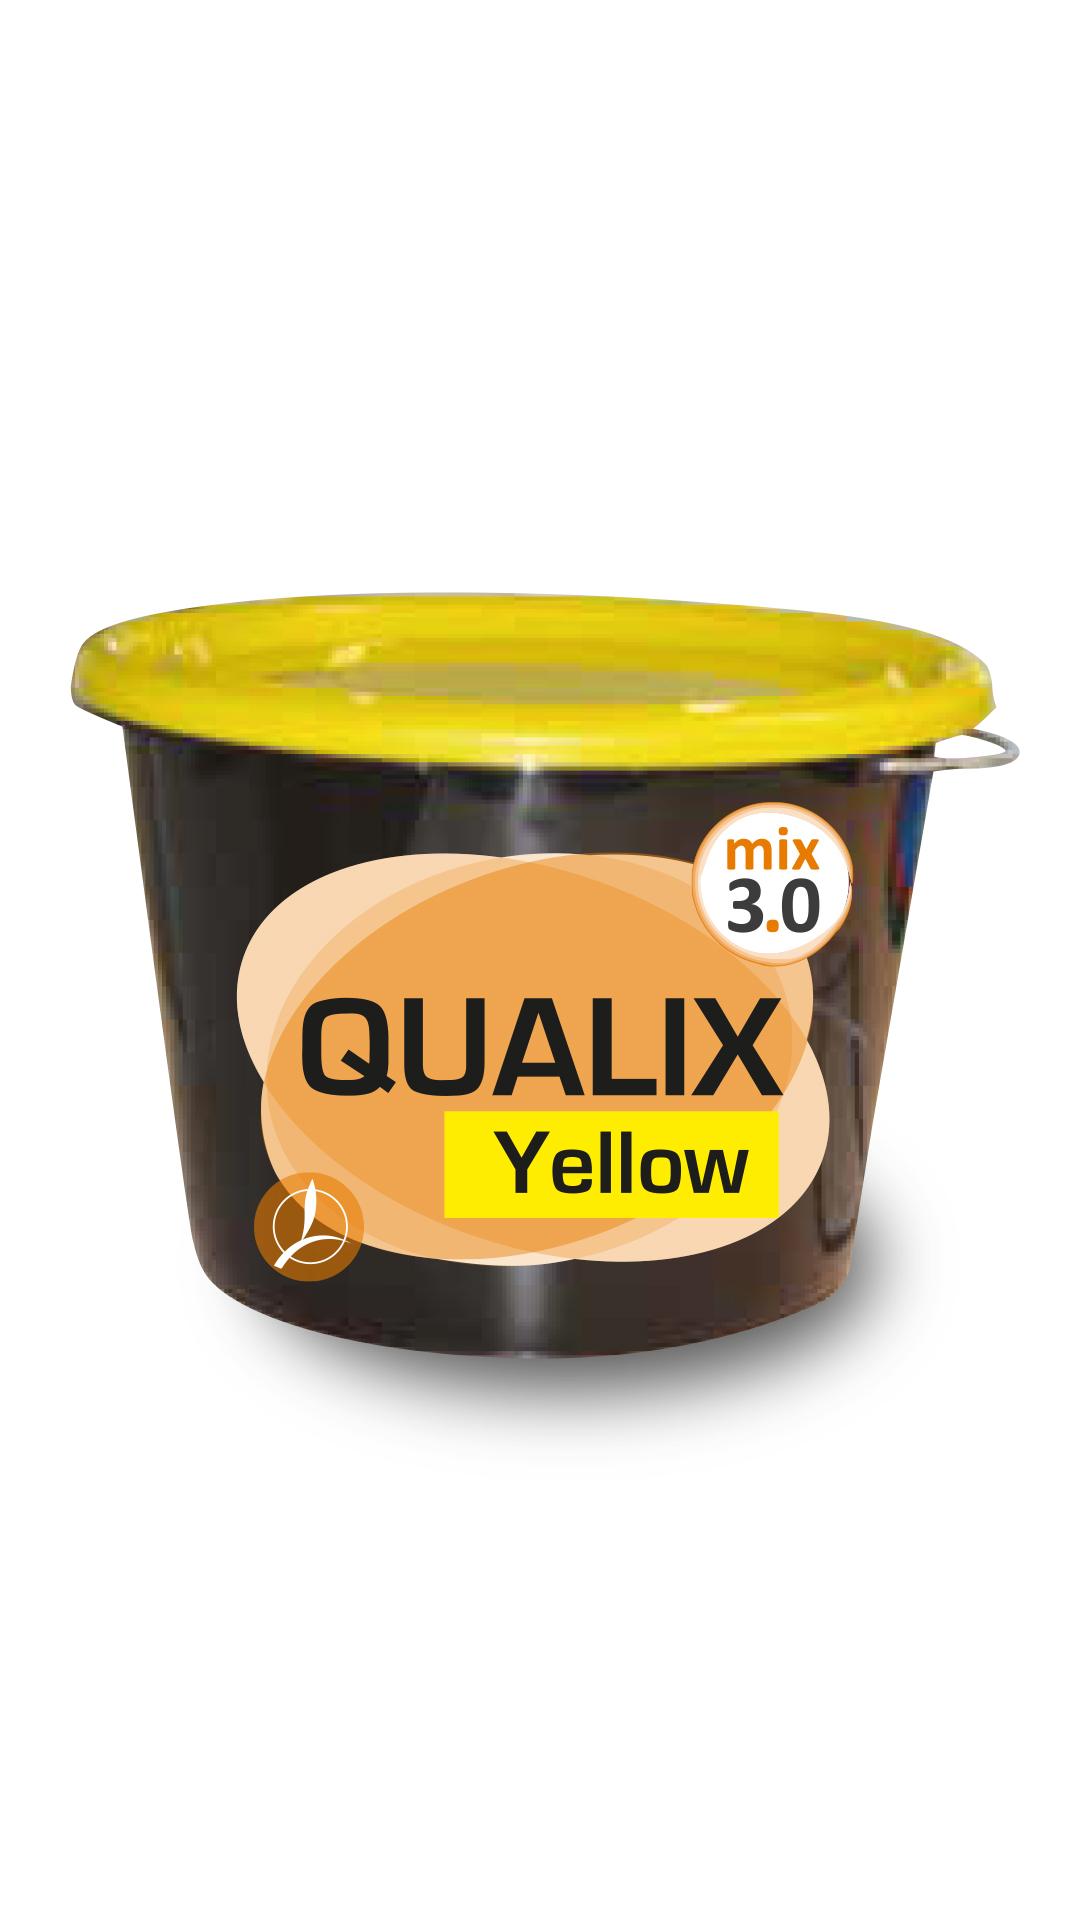 QUALIX YELLOW